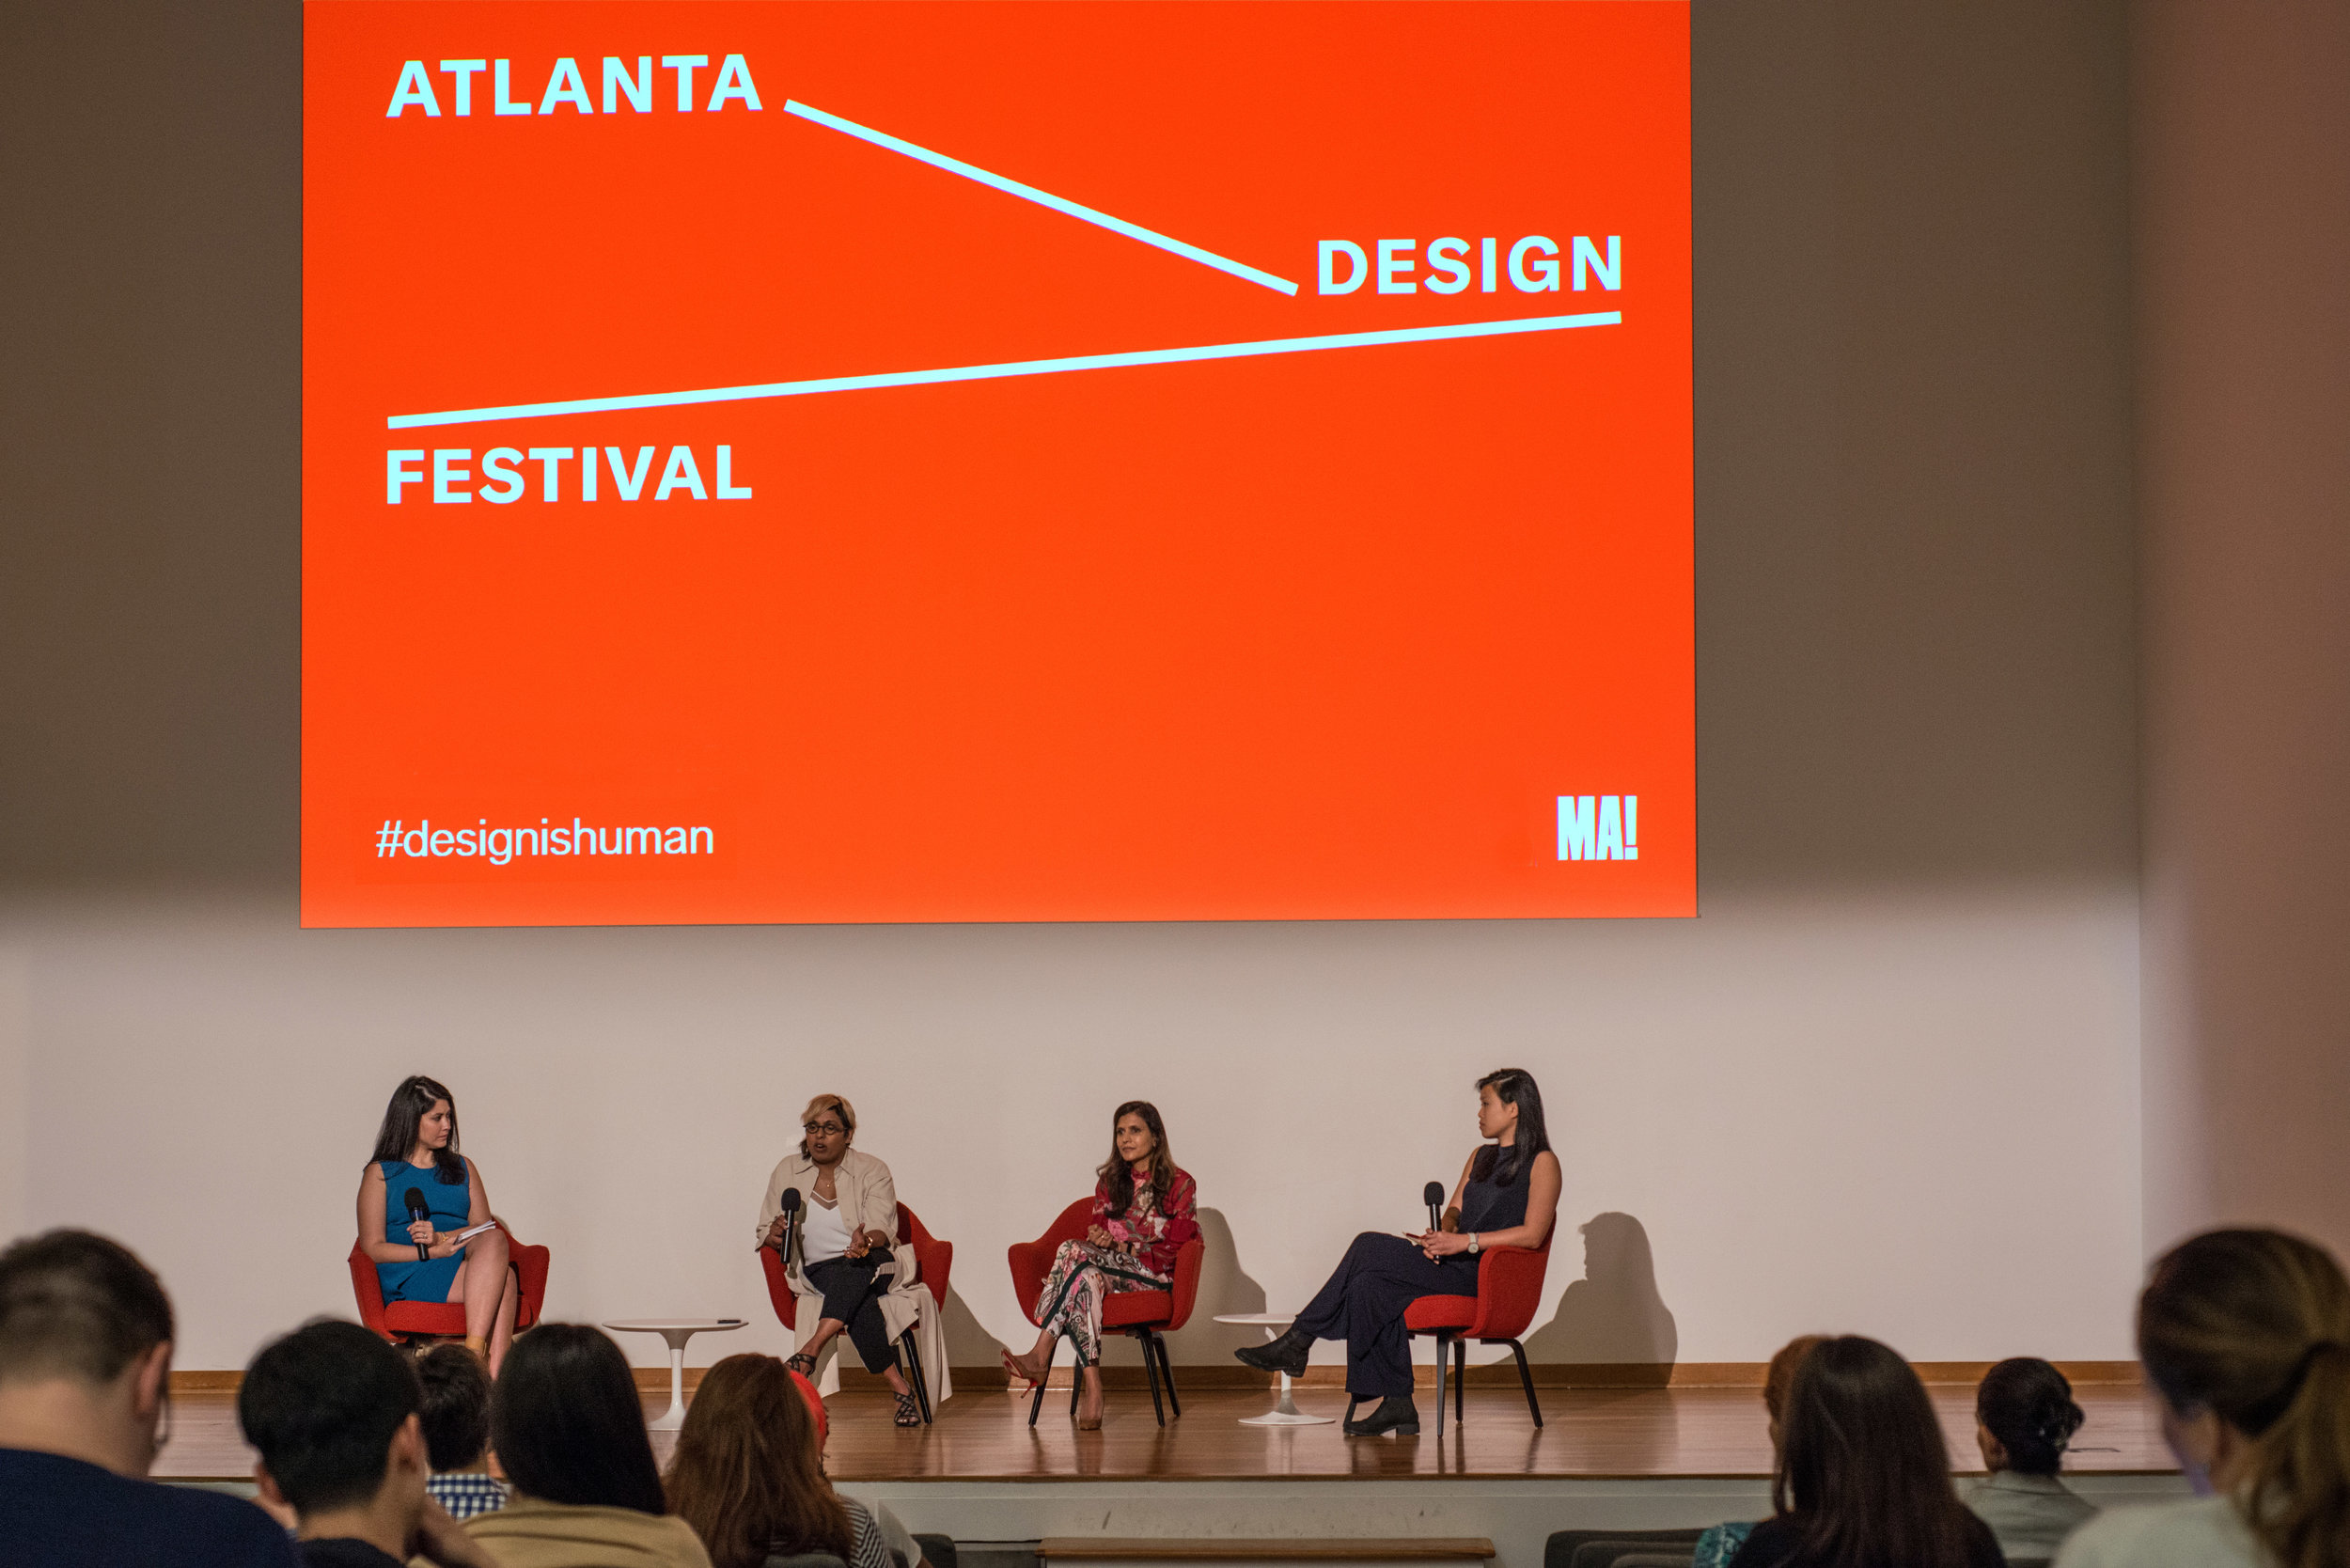 Studio-Verena-Hennig-Atlanta-Design-Festival-Branding-2 Kopie.jpg